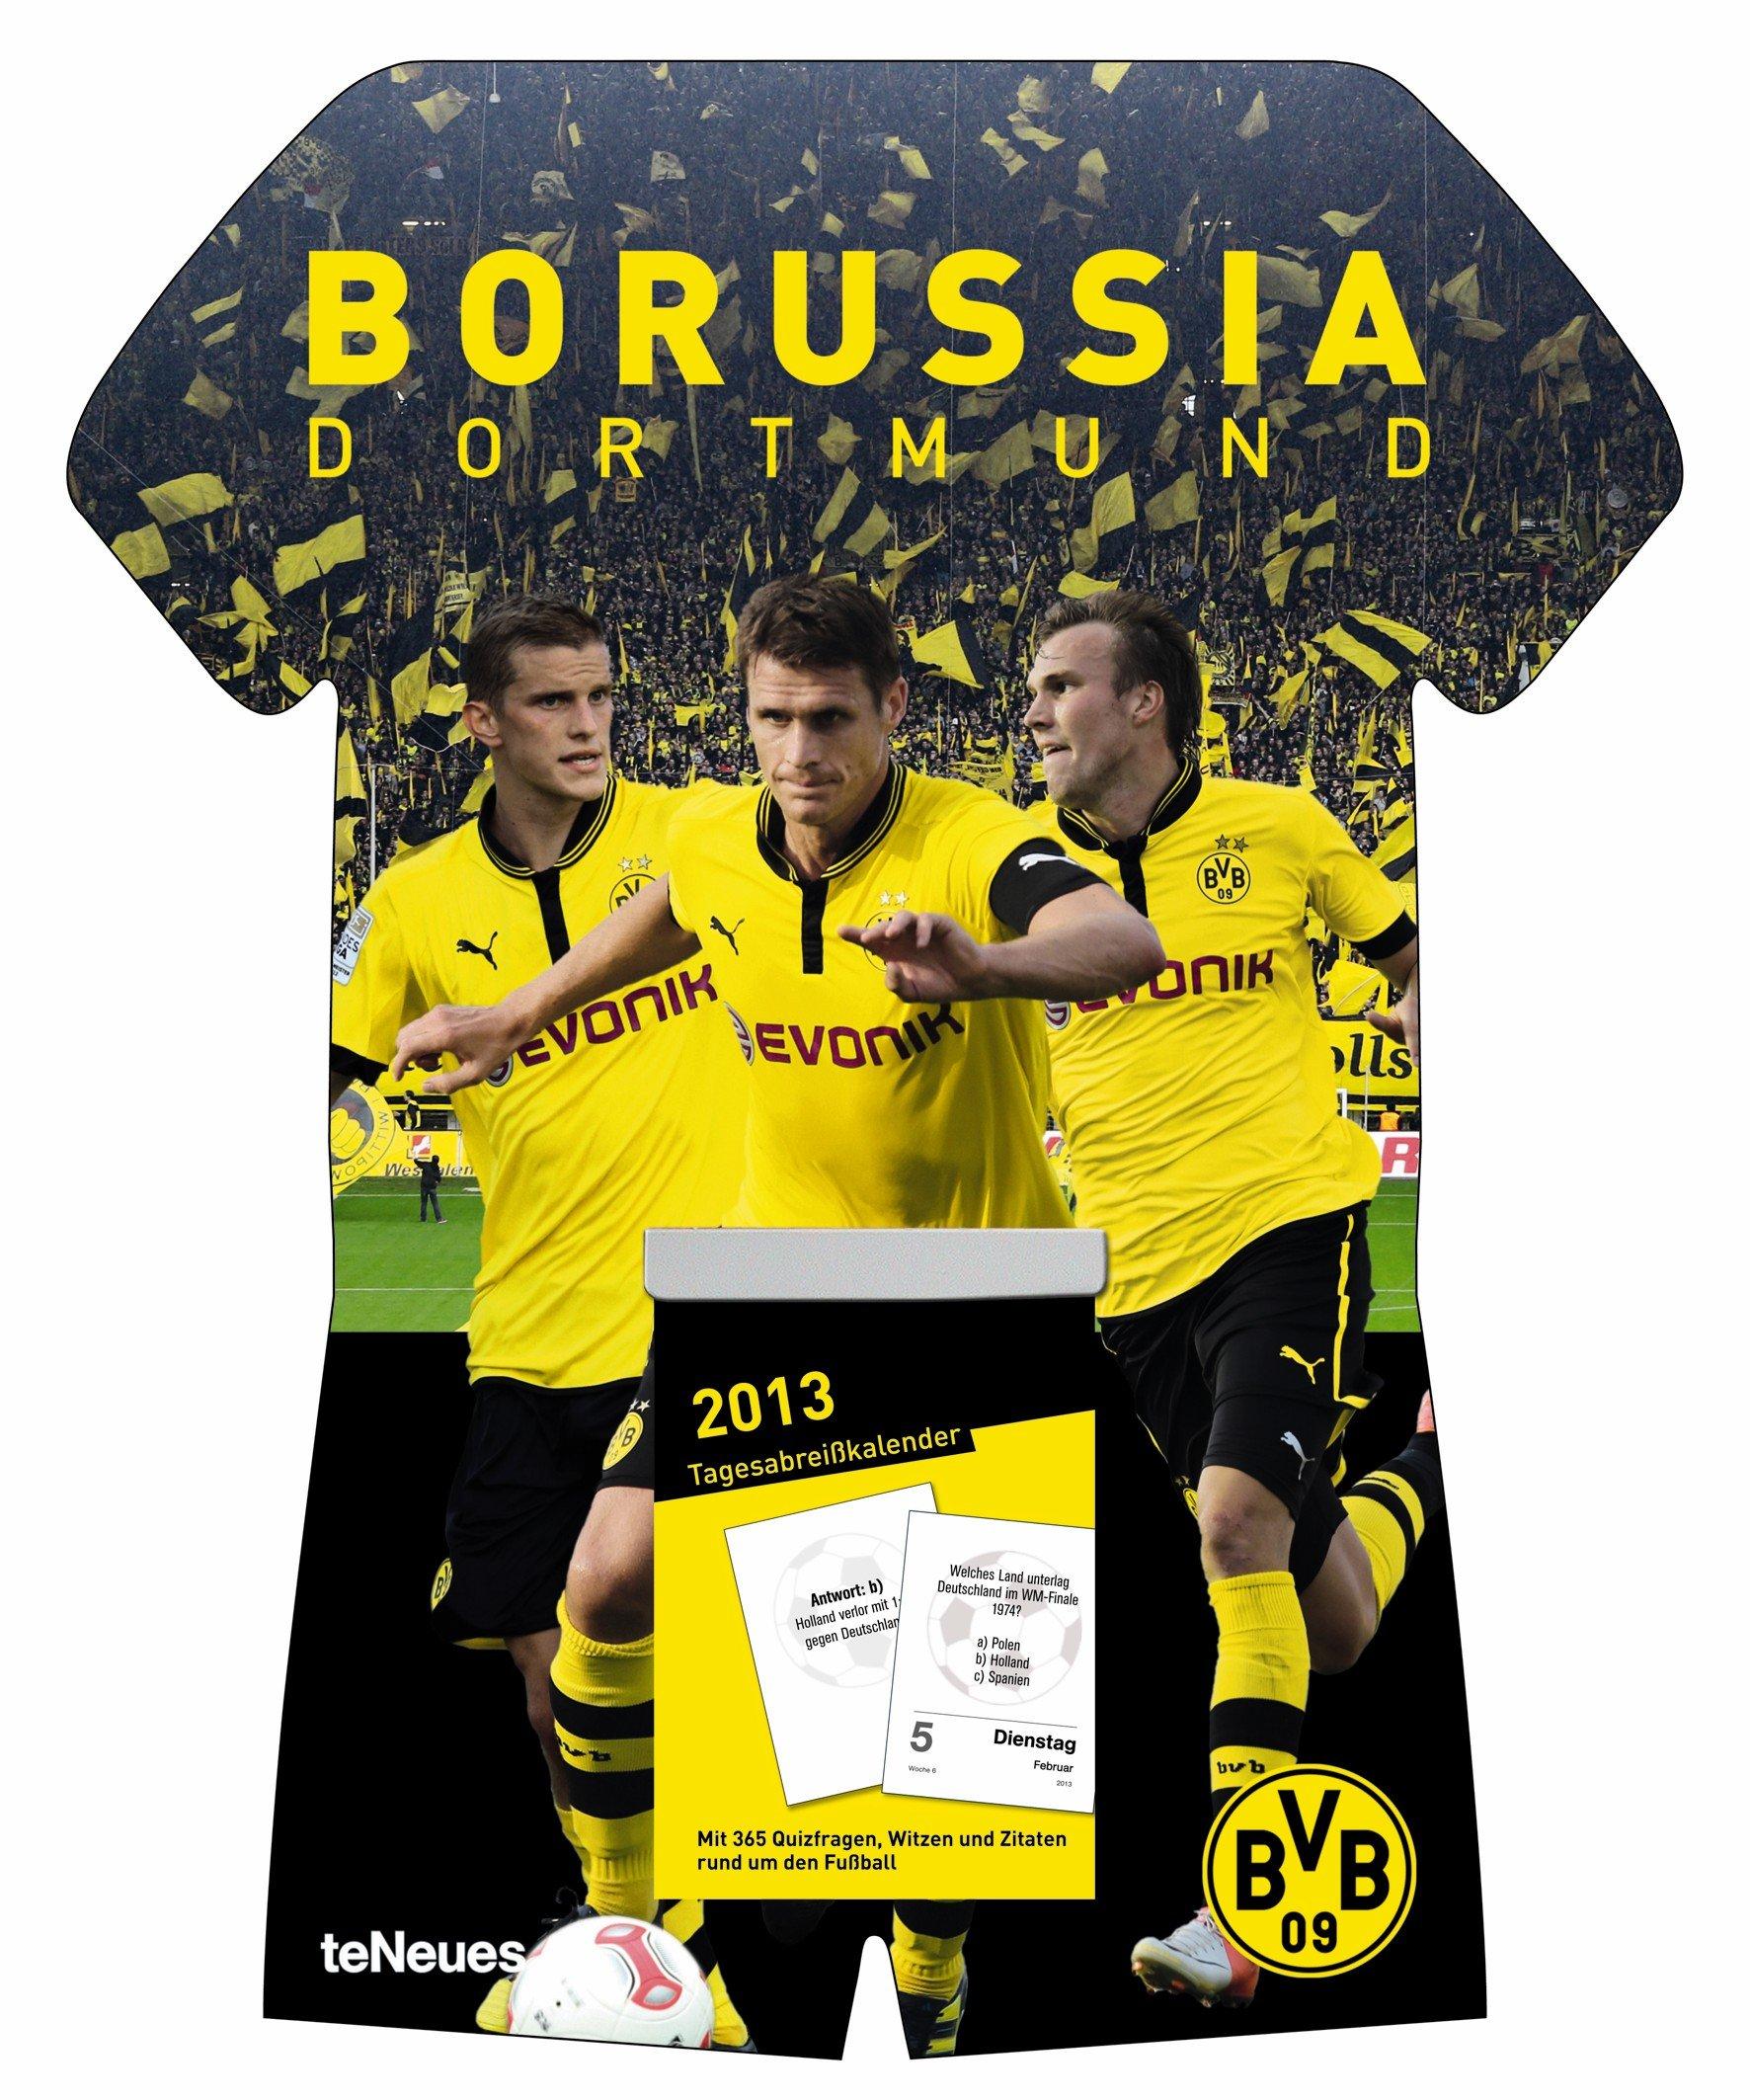 Borussia Dortmund 2013 Tagesabreißkalender